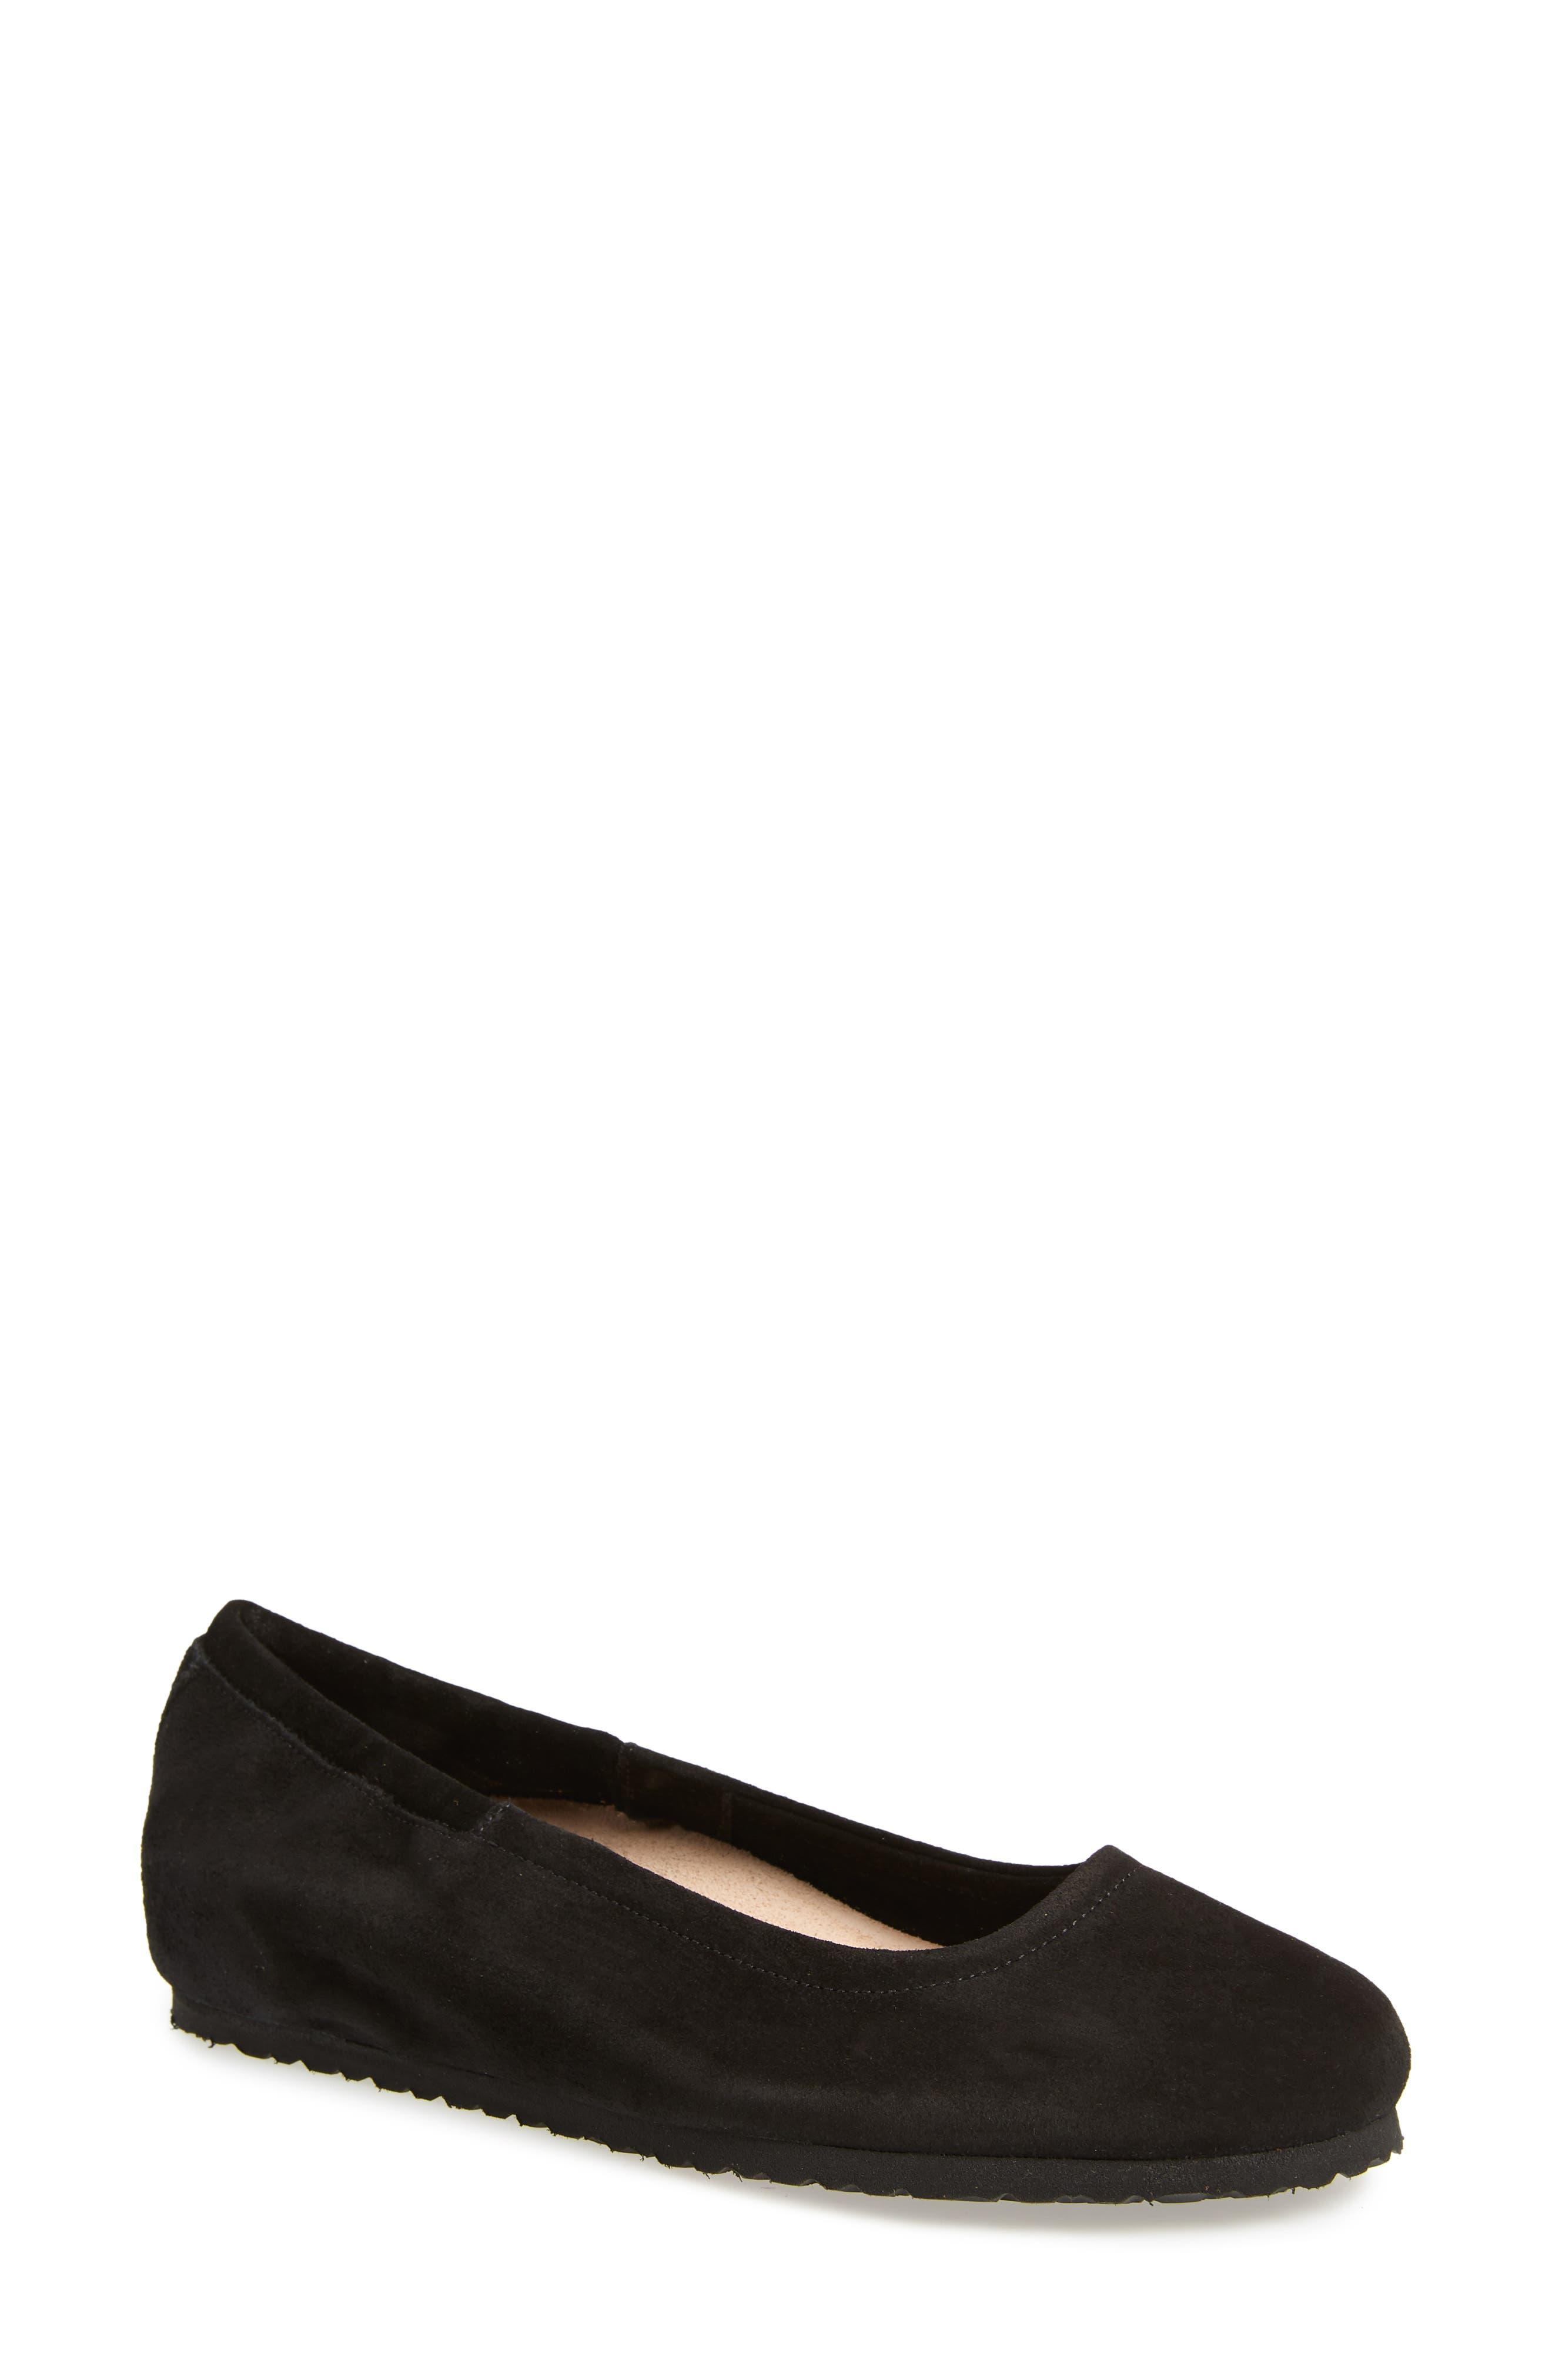 Birkenstock Celina Ballet Flat, Black